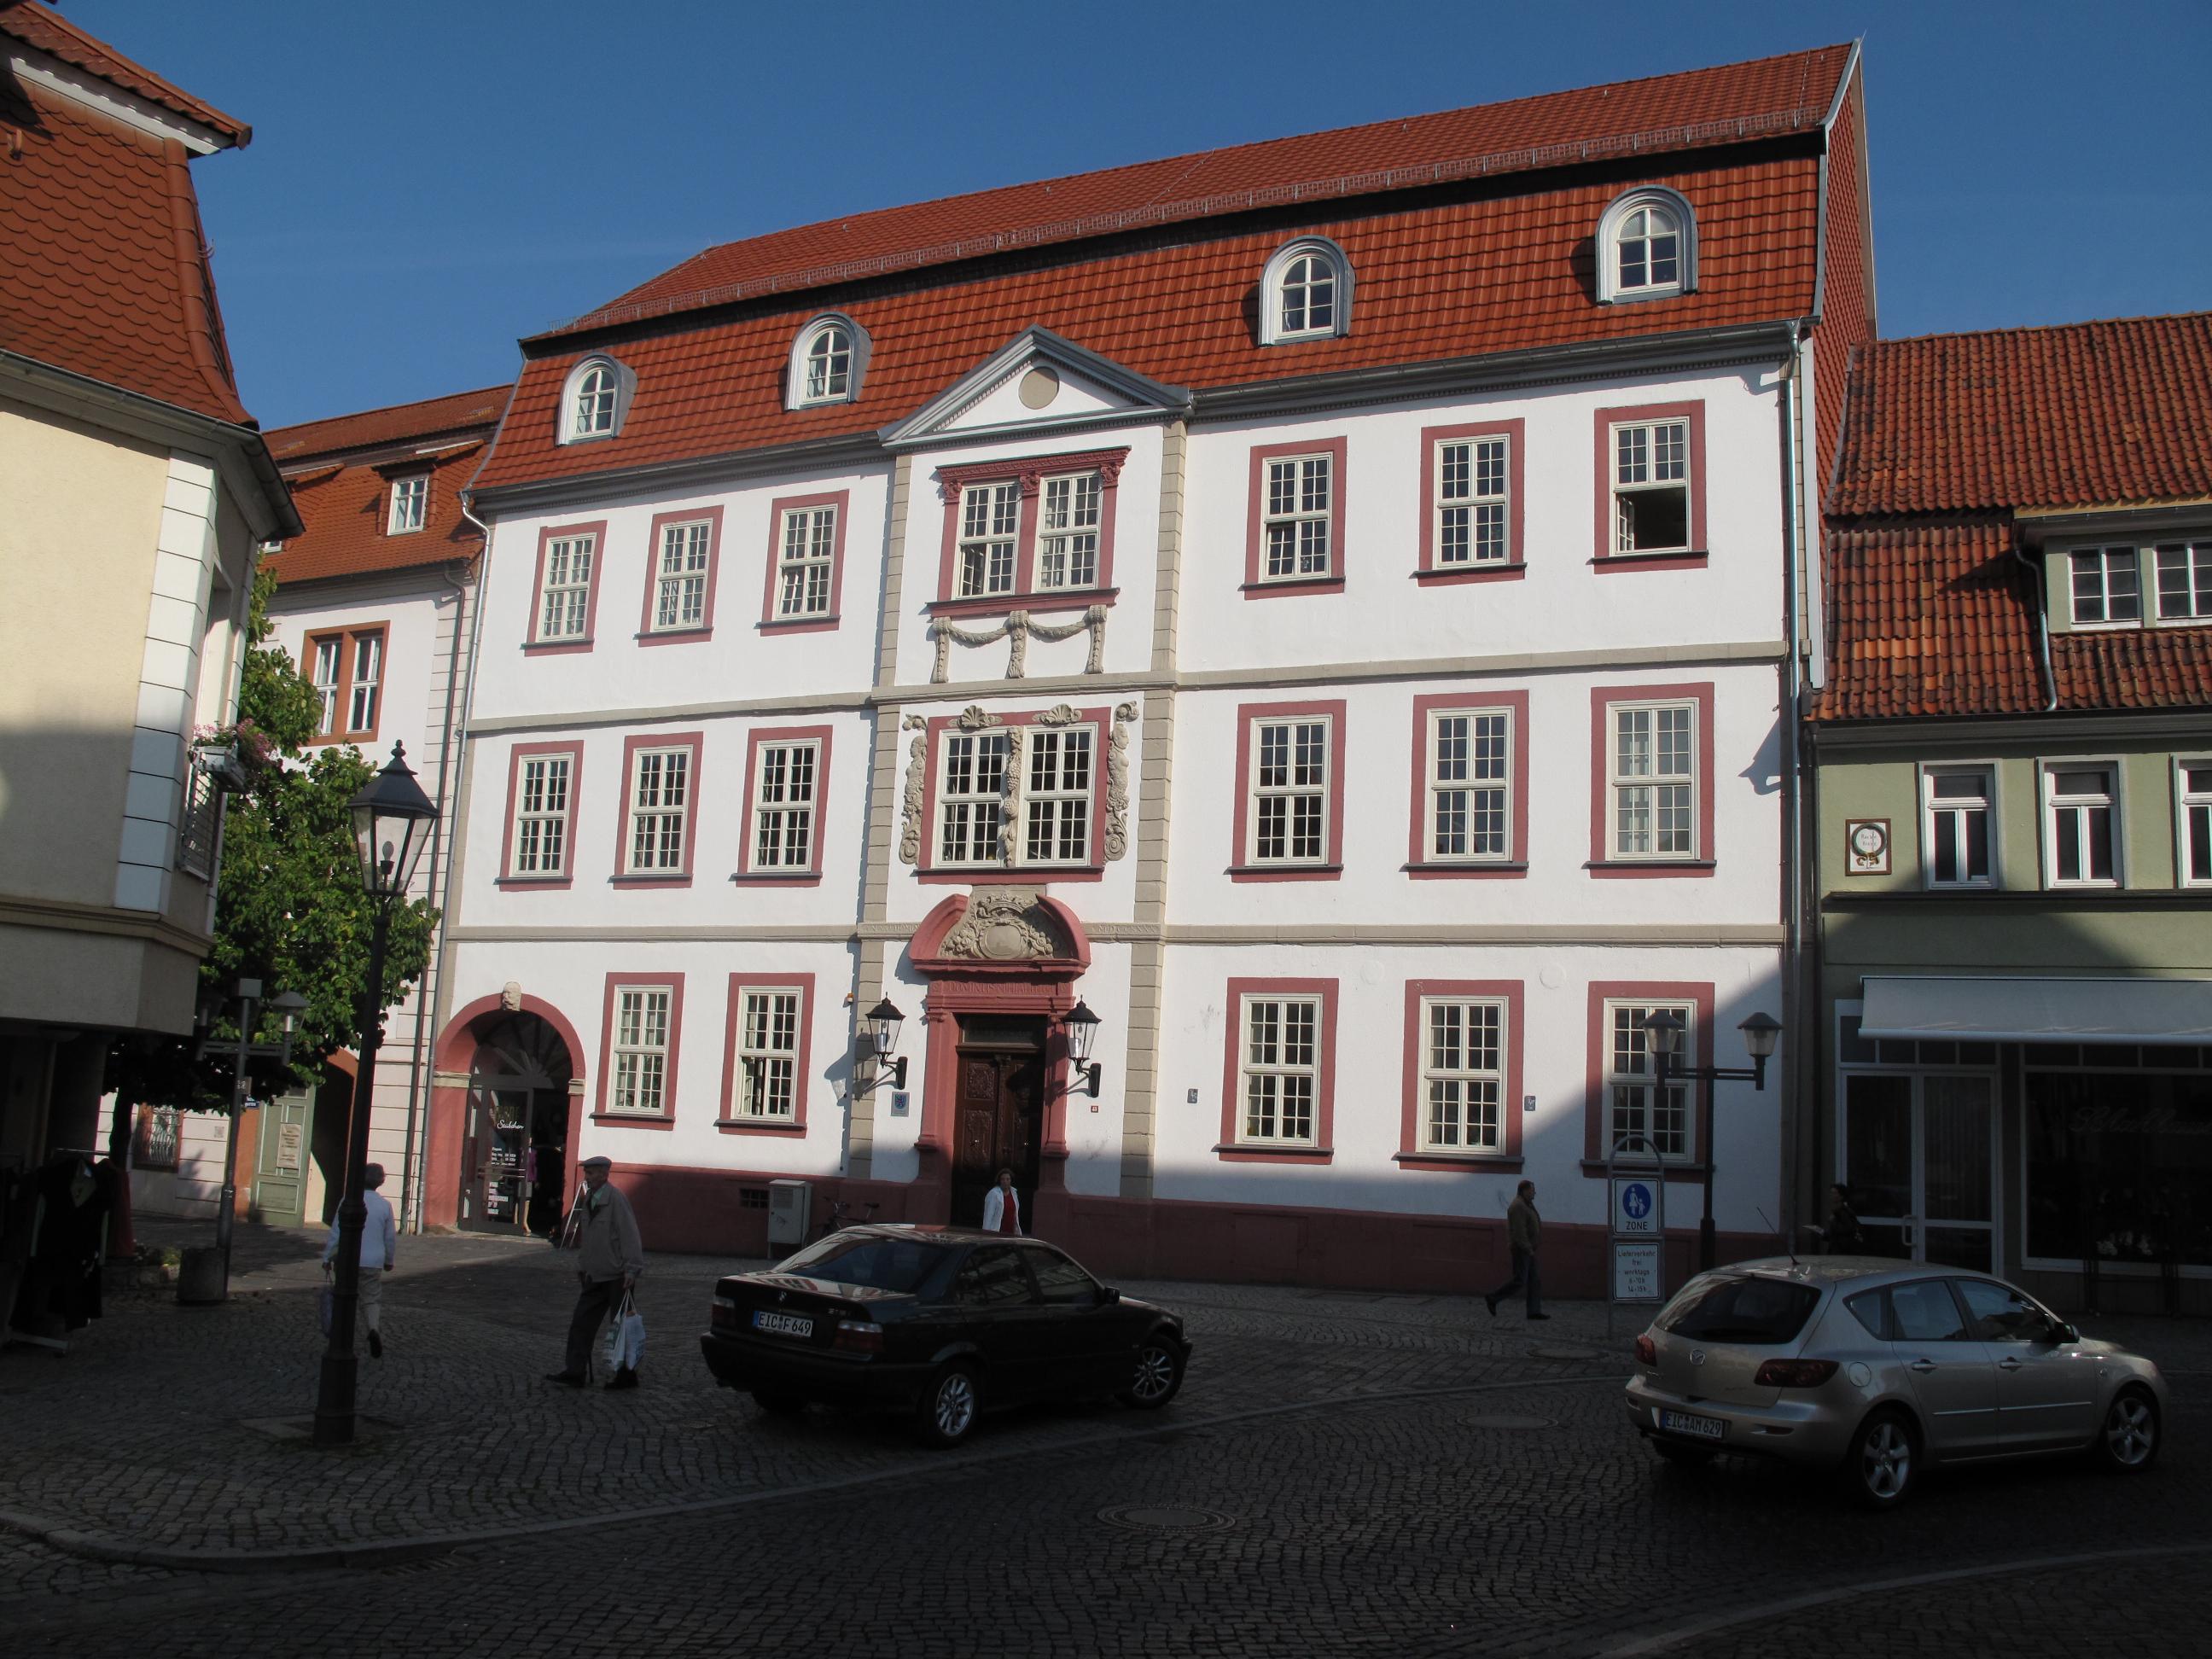 Bild: Gerichtsgebäude des Amtsgerichts Heilbad Heiligenstadt